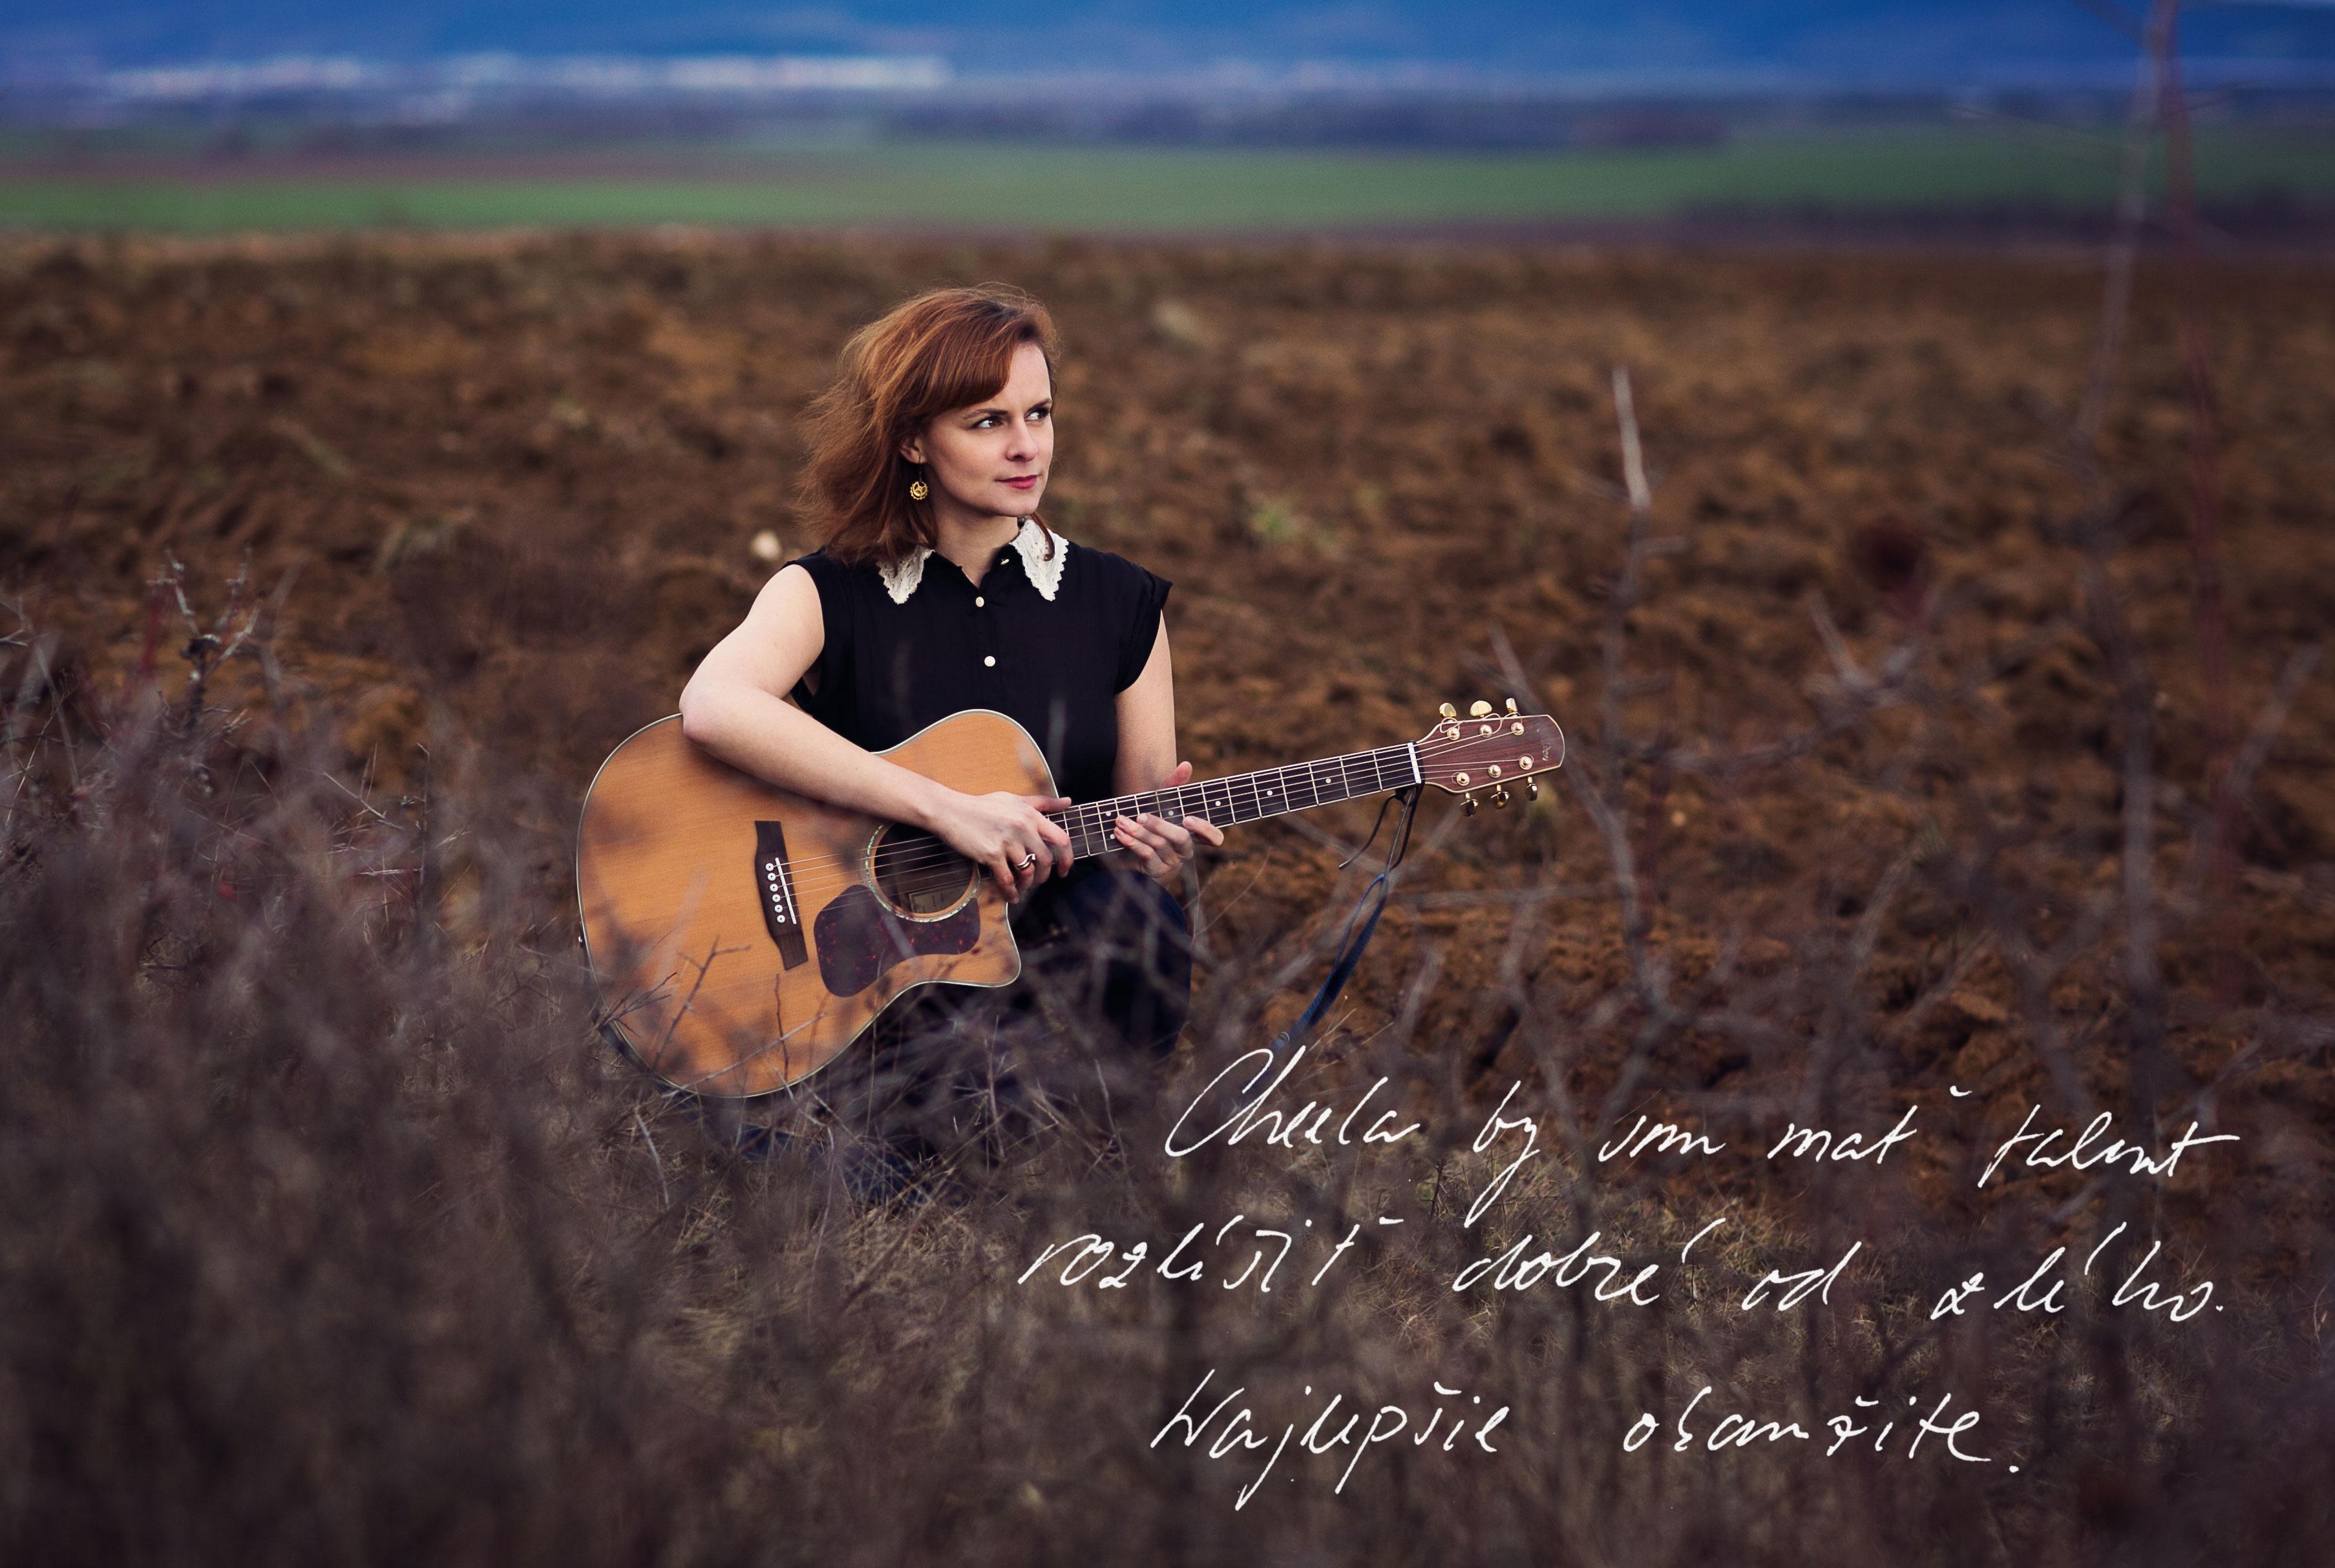 Dominika Truban, žena s gitarou v poli